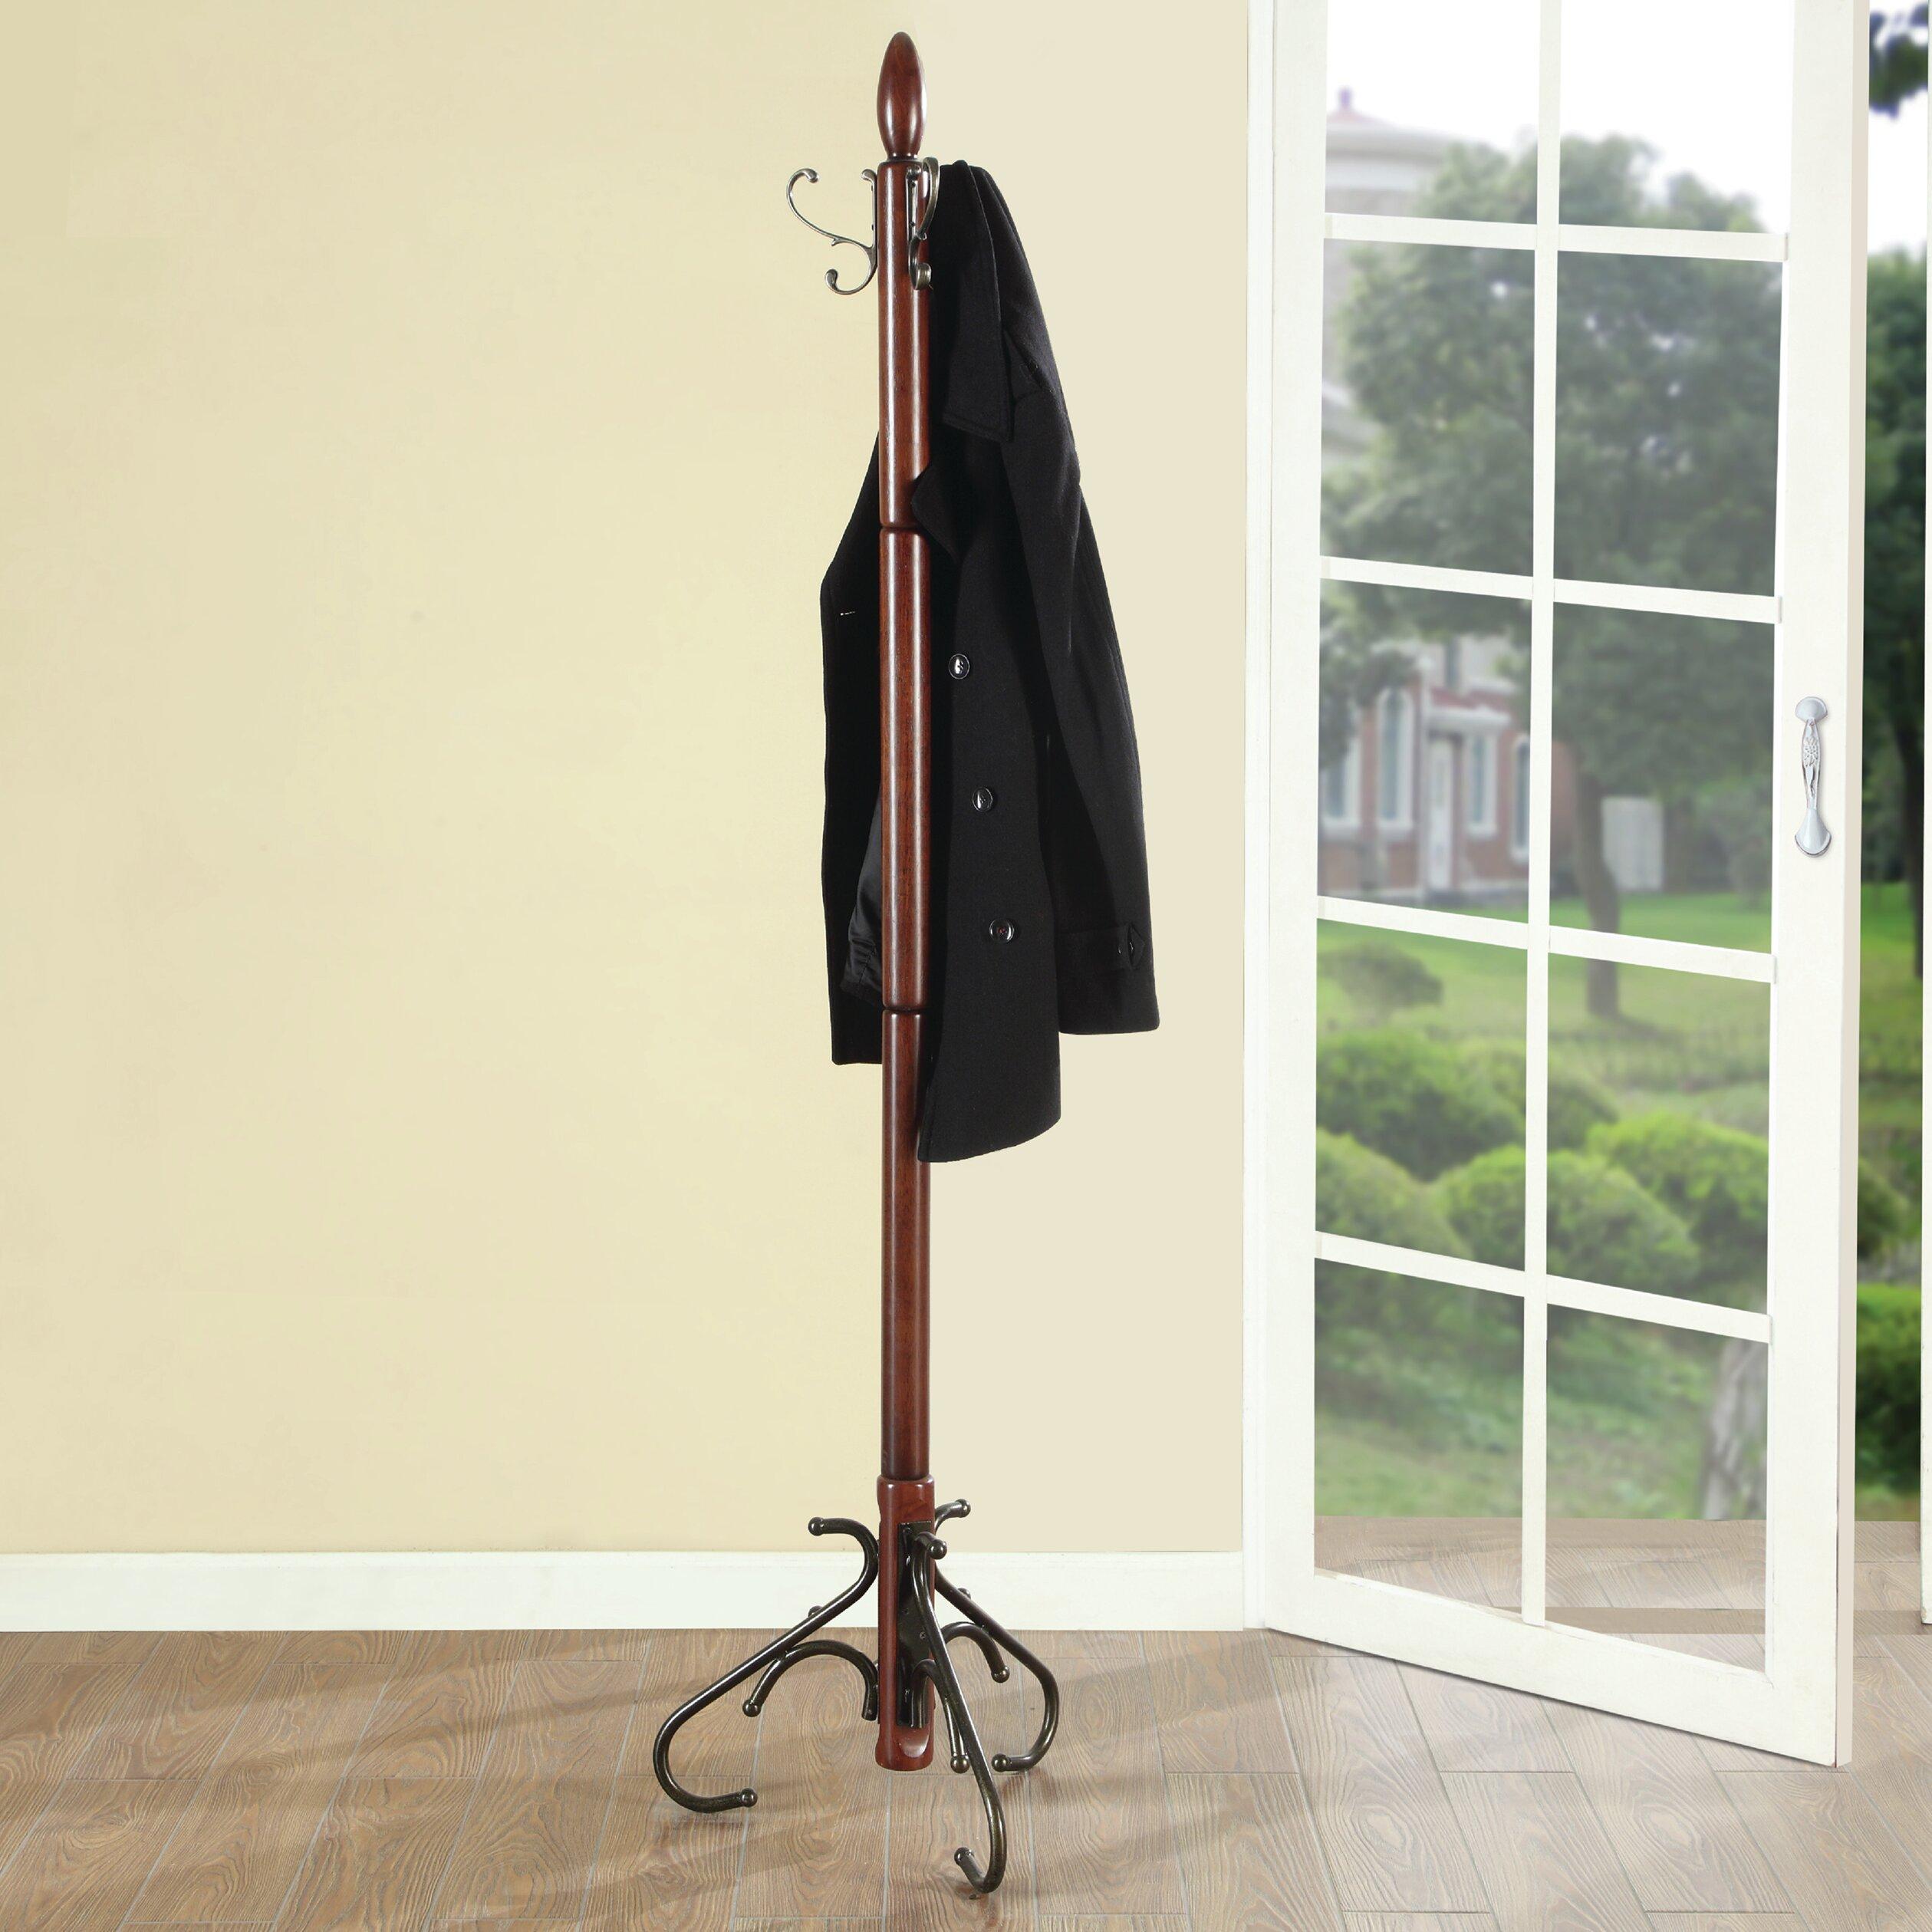 homestar reviews furniture clothes pdx coat metal pinnacle rack wayfair